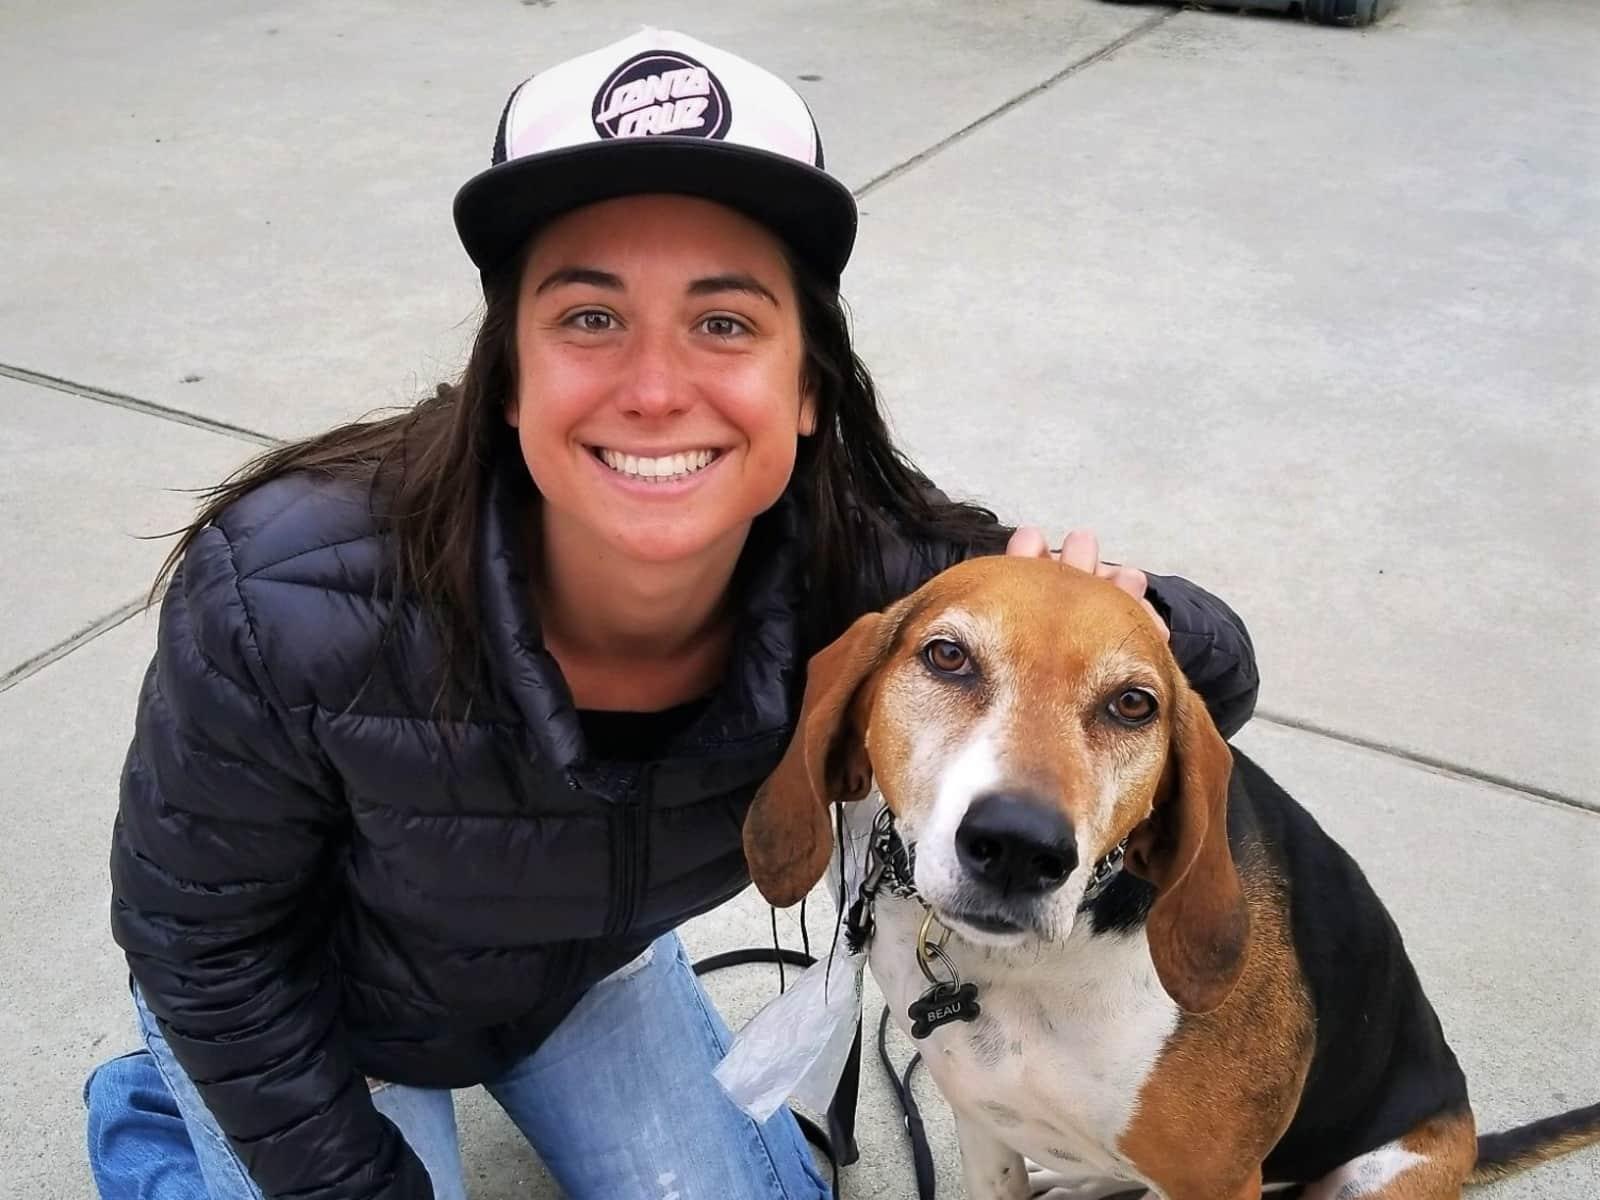 Rebekah from Santa Cruz, California, United States